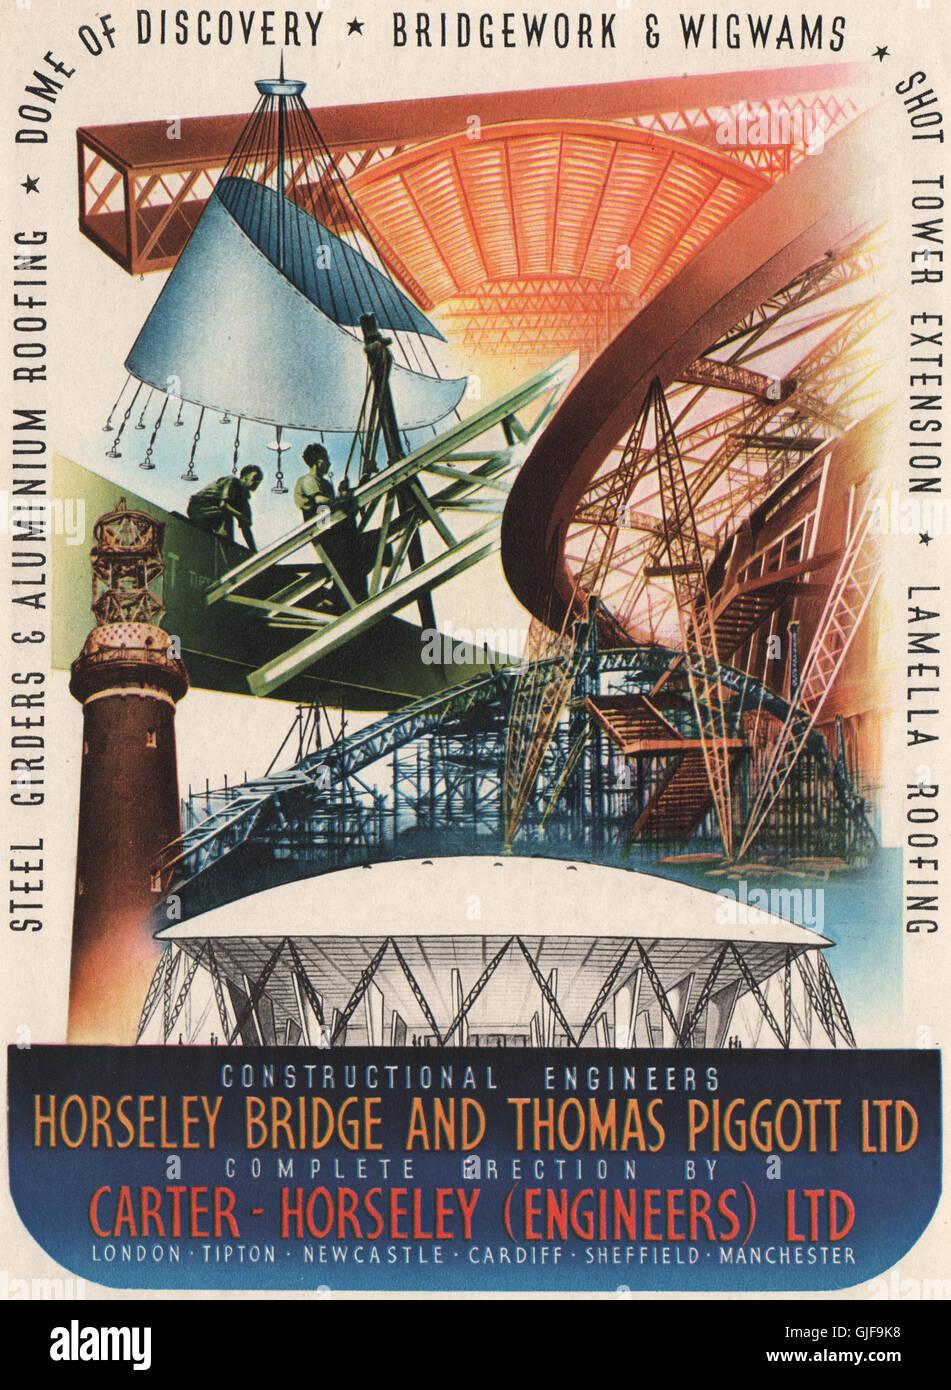 FESTIVAL OF BRITAIN. Horseley Bridge. Thomas Piggott. Engineers, print 1951 - Stock Image